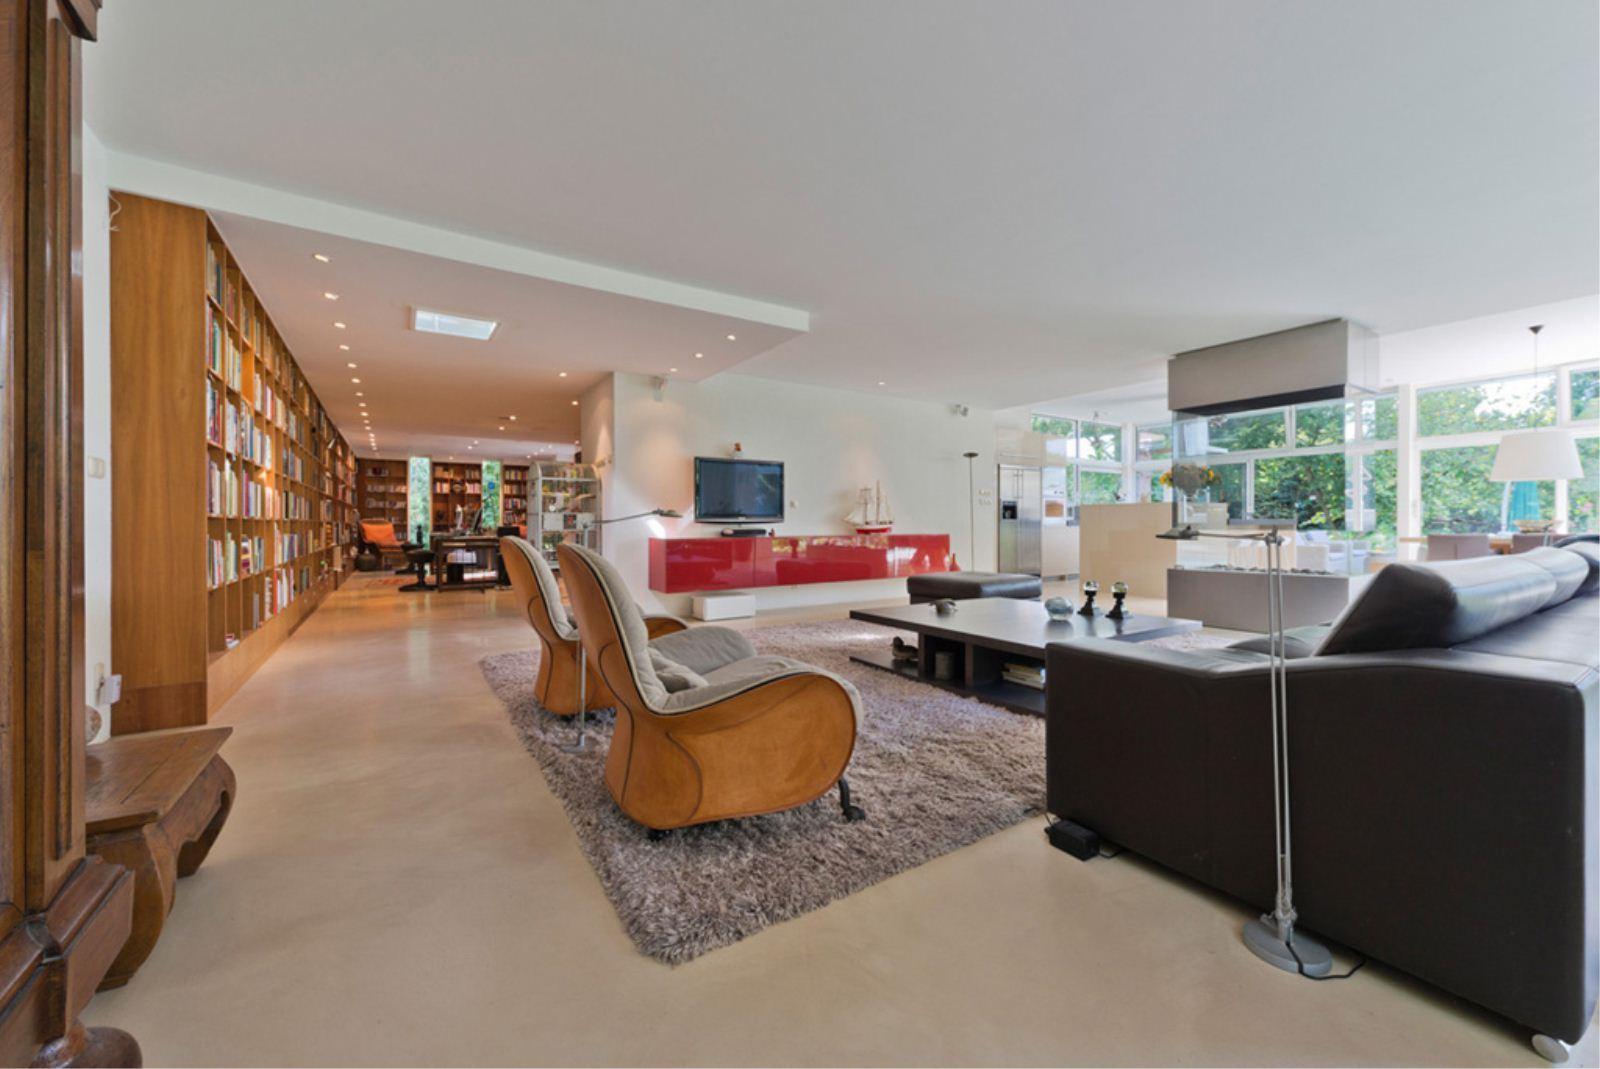 Martin gaus verkoopt mega luxe villa interveste infonet - Woonkamer m ...